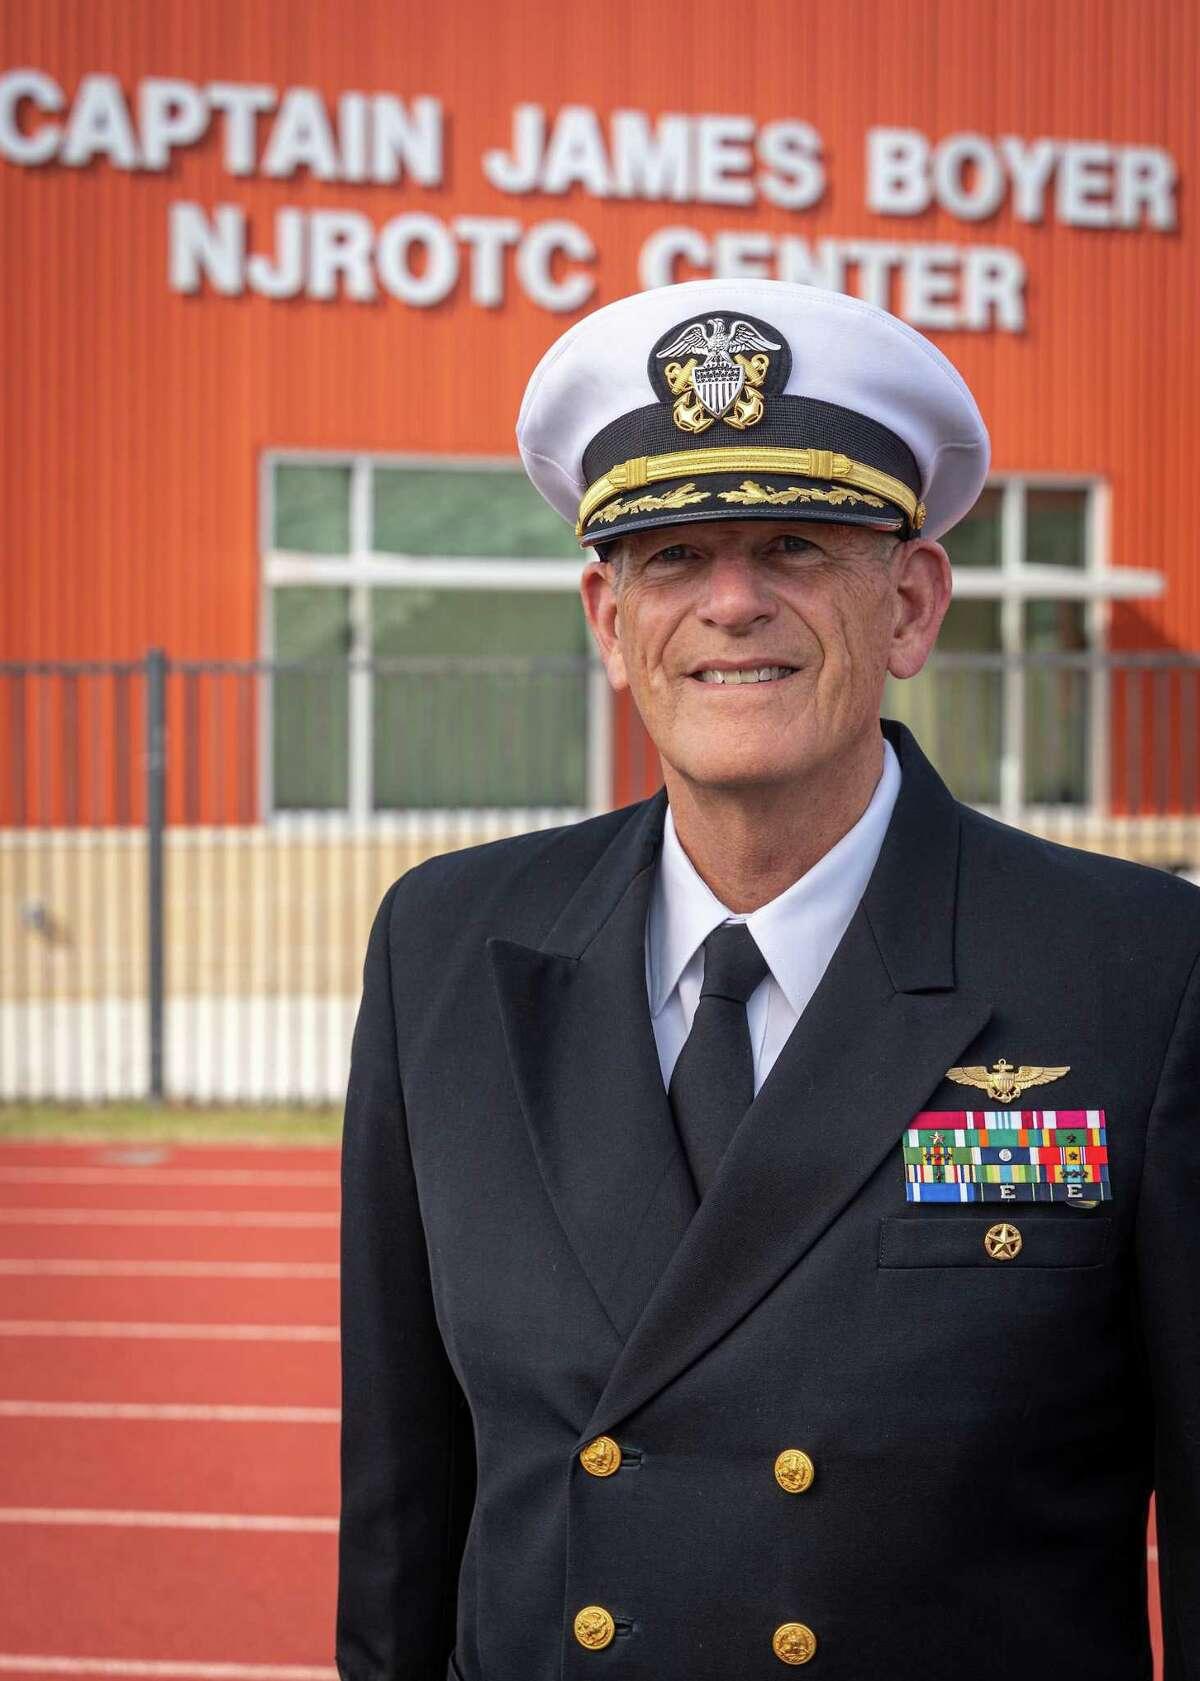 Retired U.S. Navy Capt. James Boyer, who recently retired from Spring ISD where he led the Navy JROTC program.